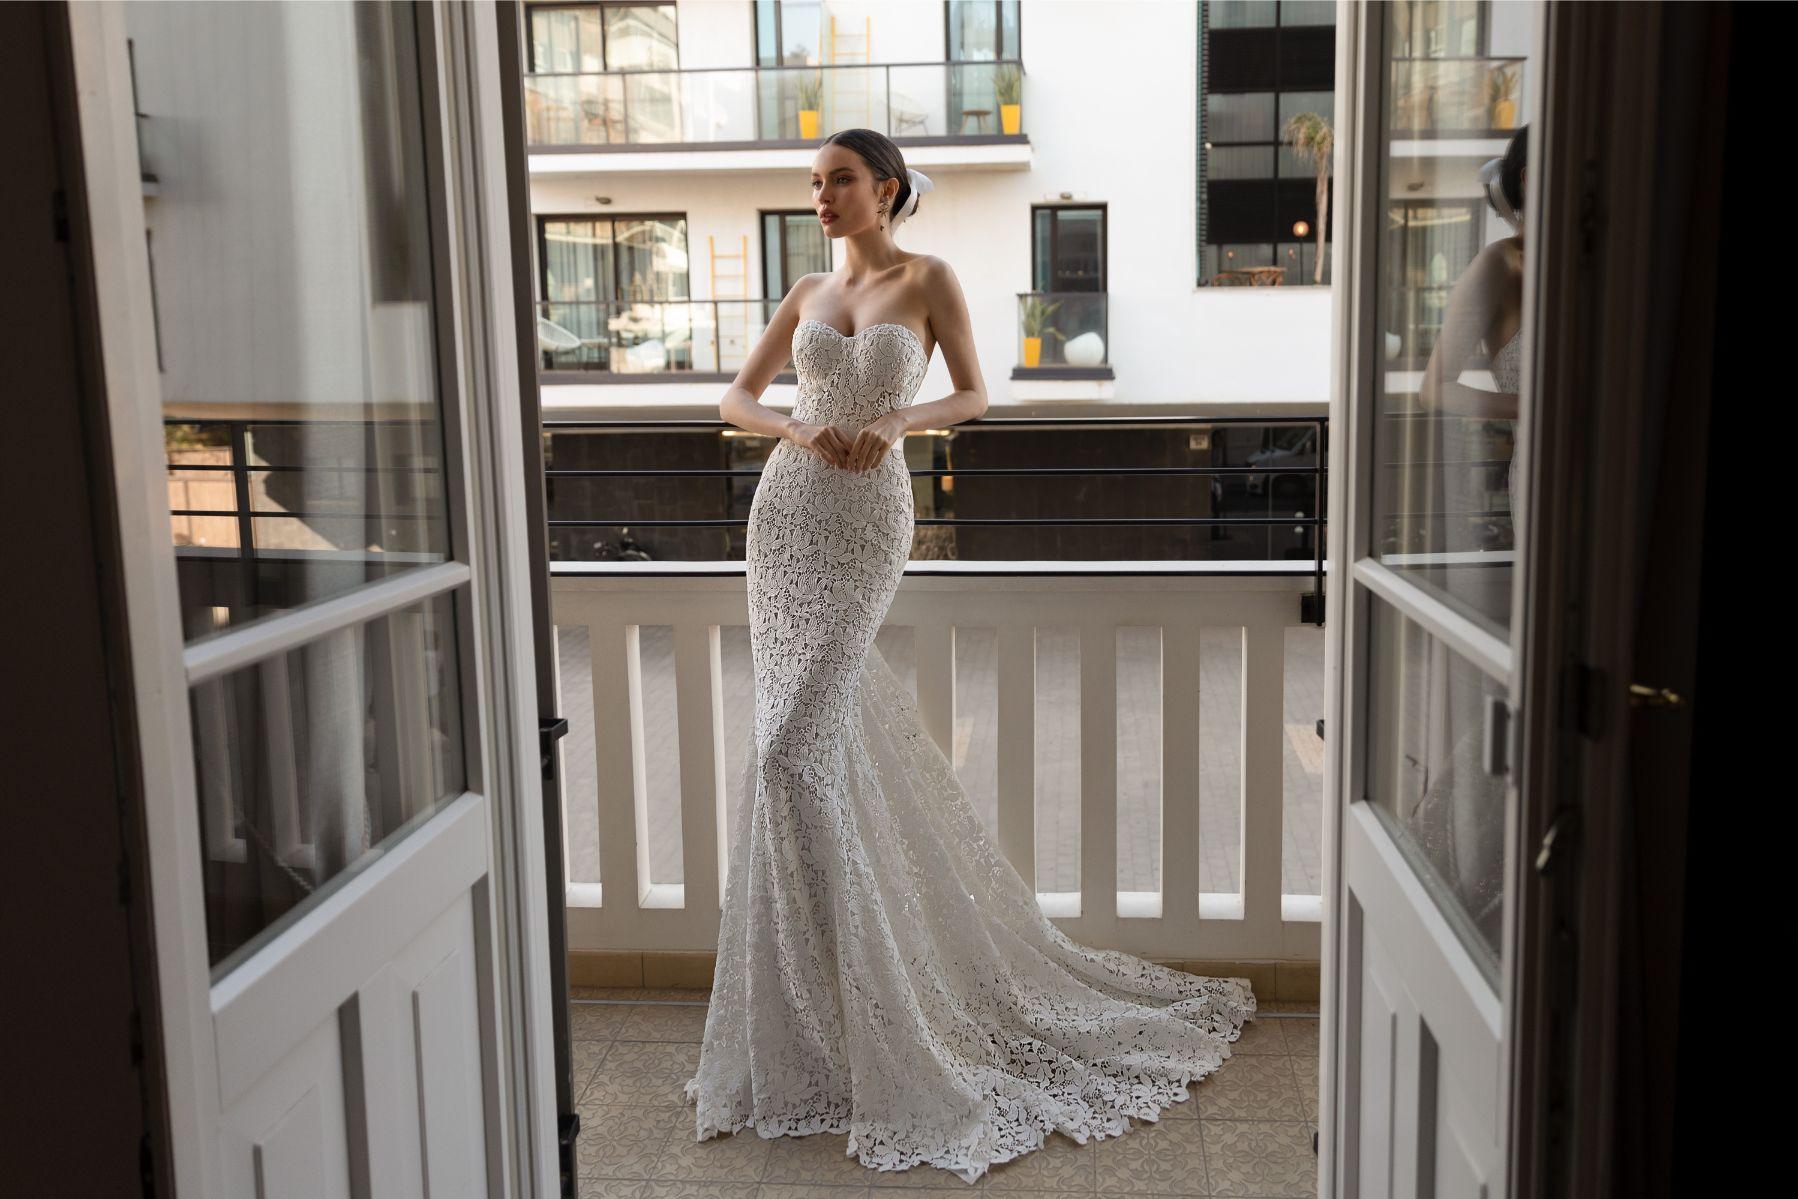 Wedding Dresses For Sale Olx – DACC